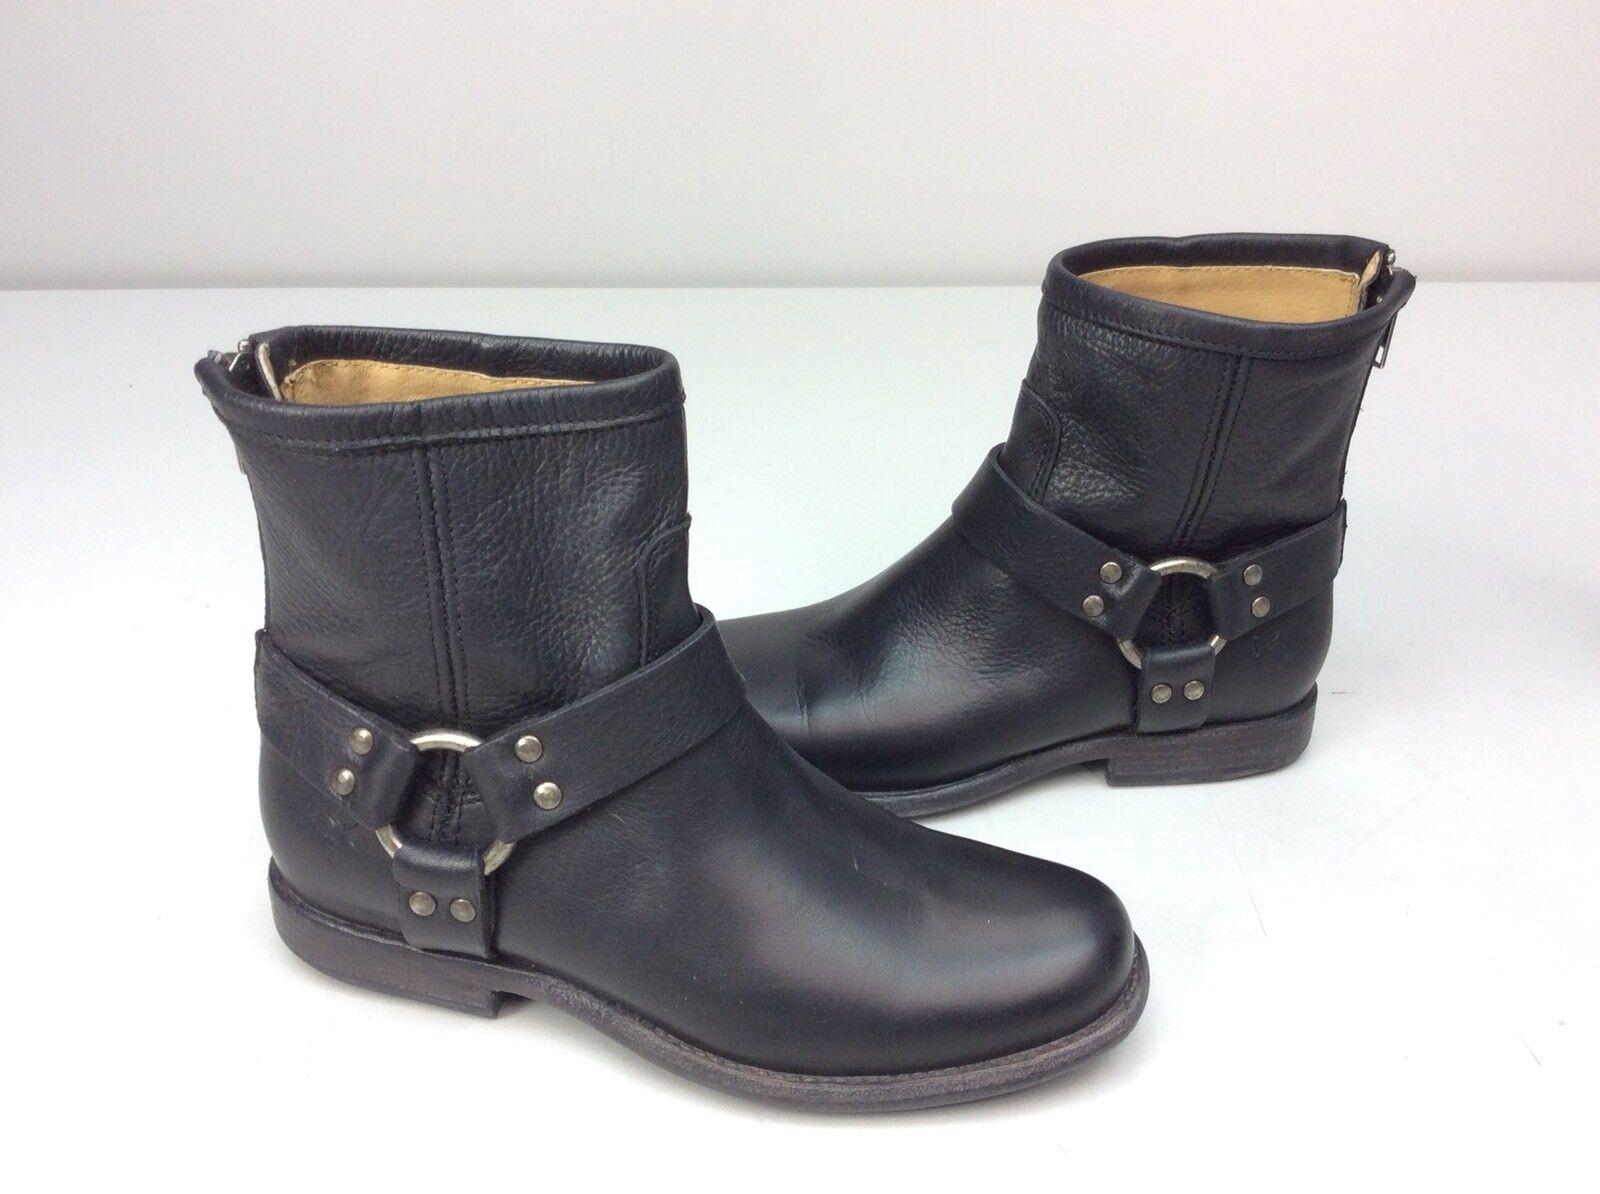 Frye Phillip Harness botas botas Harness Vintage Negro Cuero Suave Tamaño 6 B Moto Motocicleta 238b51